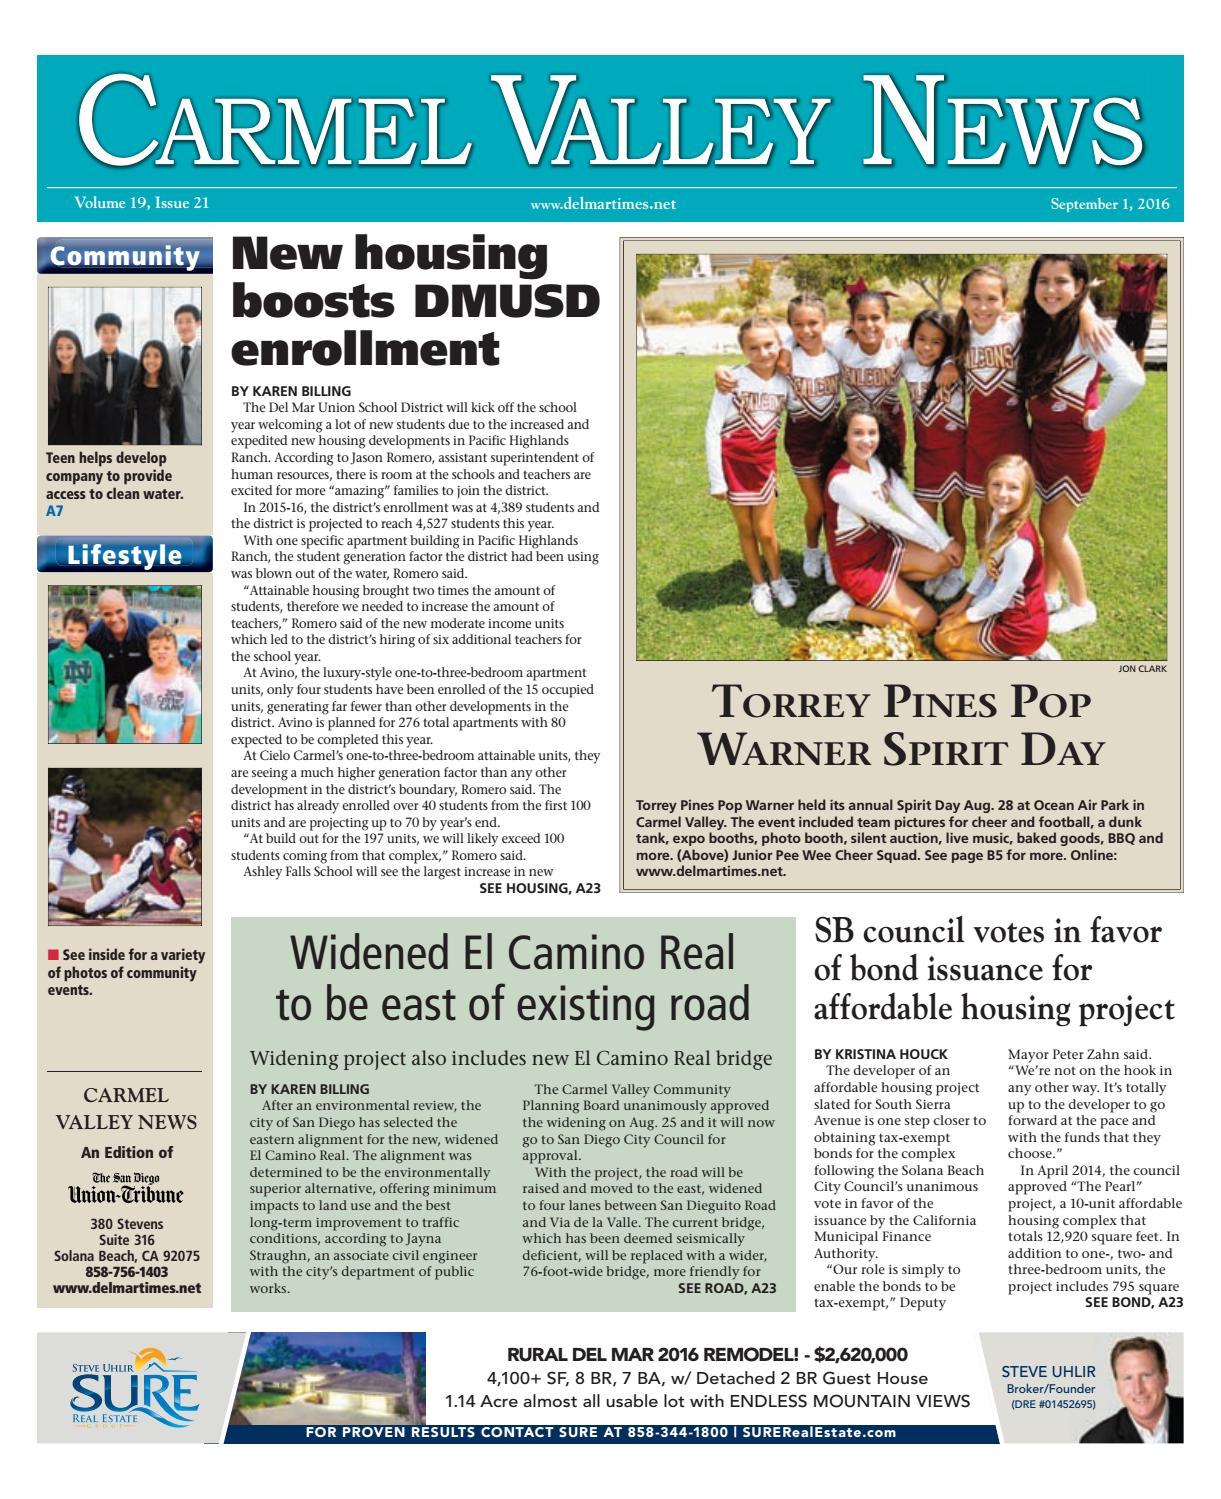 Carmel Valley News 09 01 16 By MainStreet Media